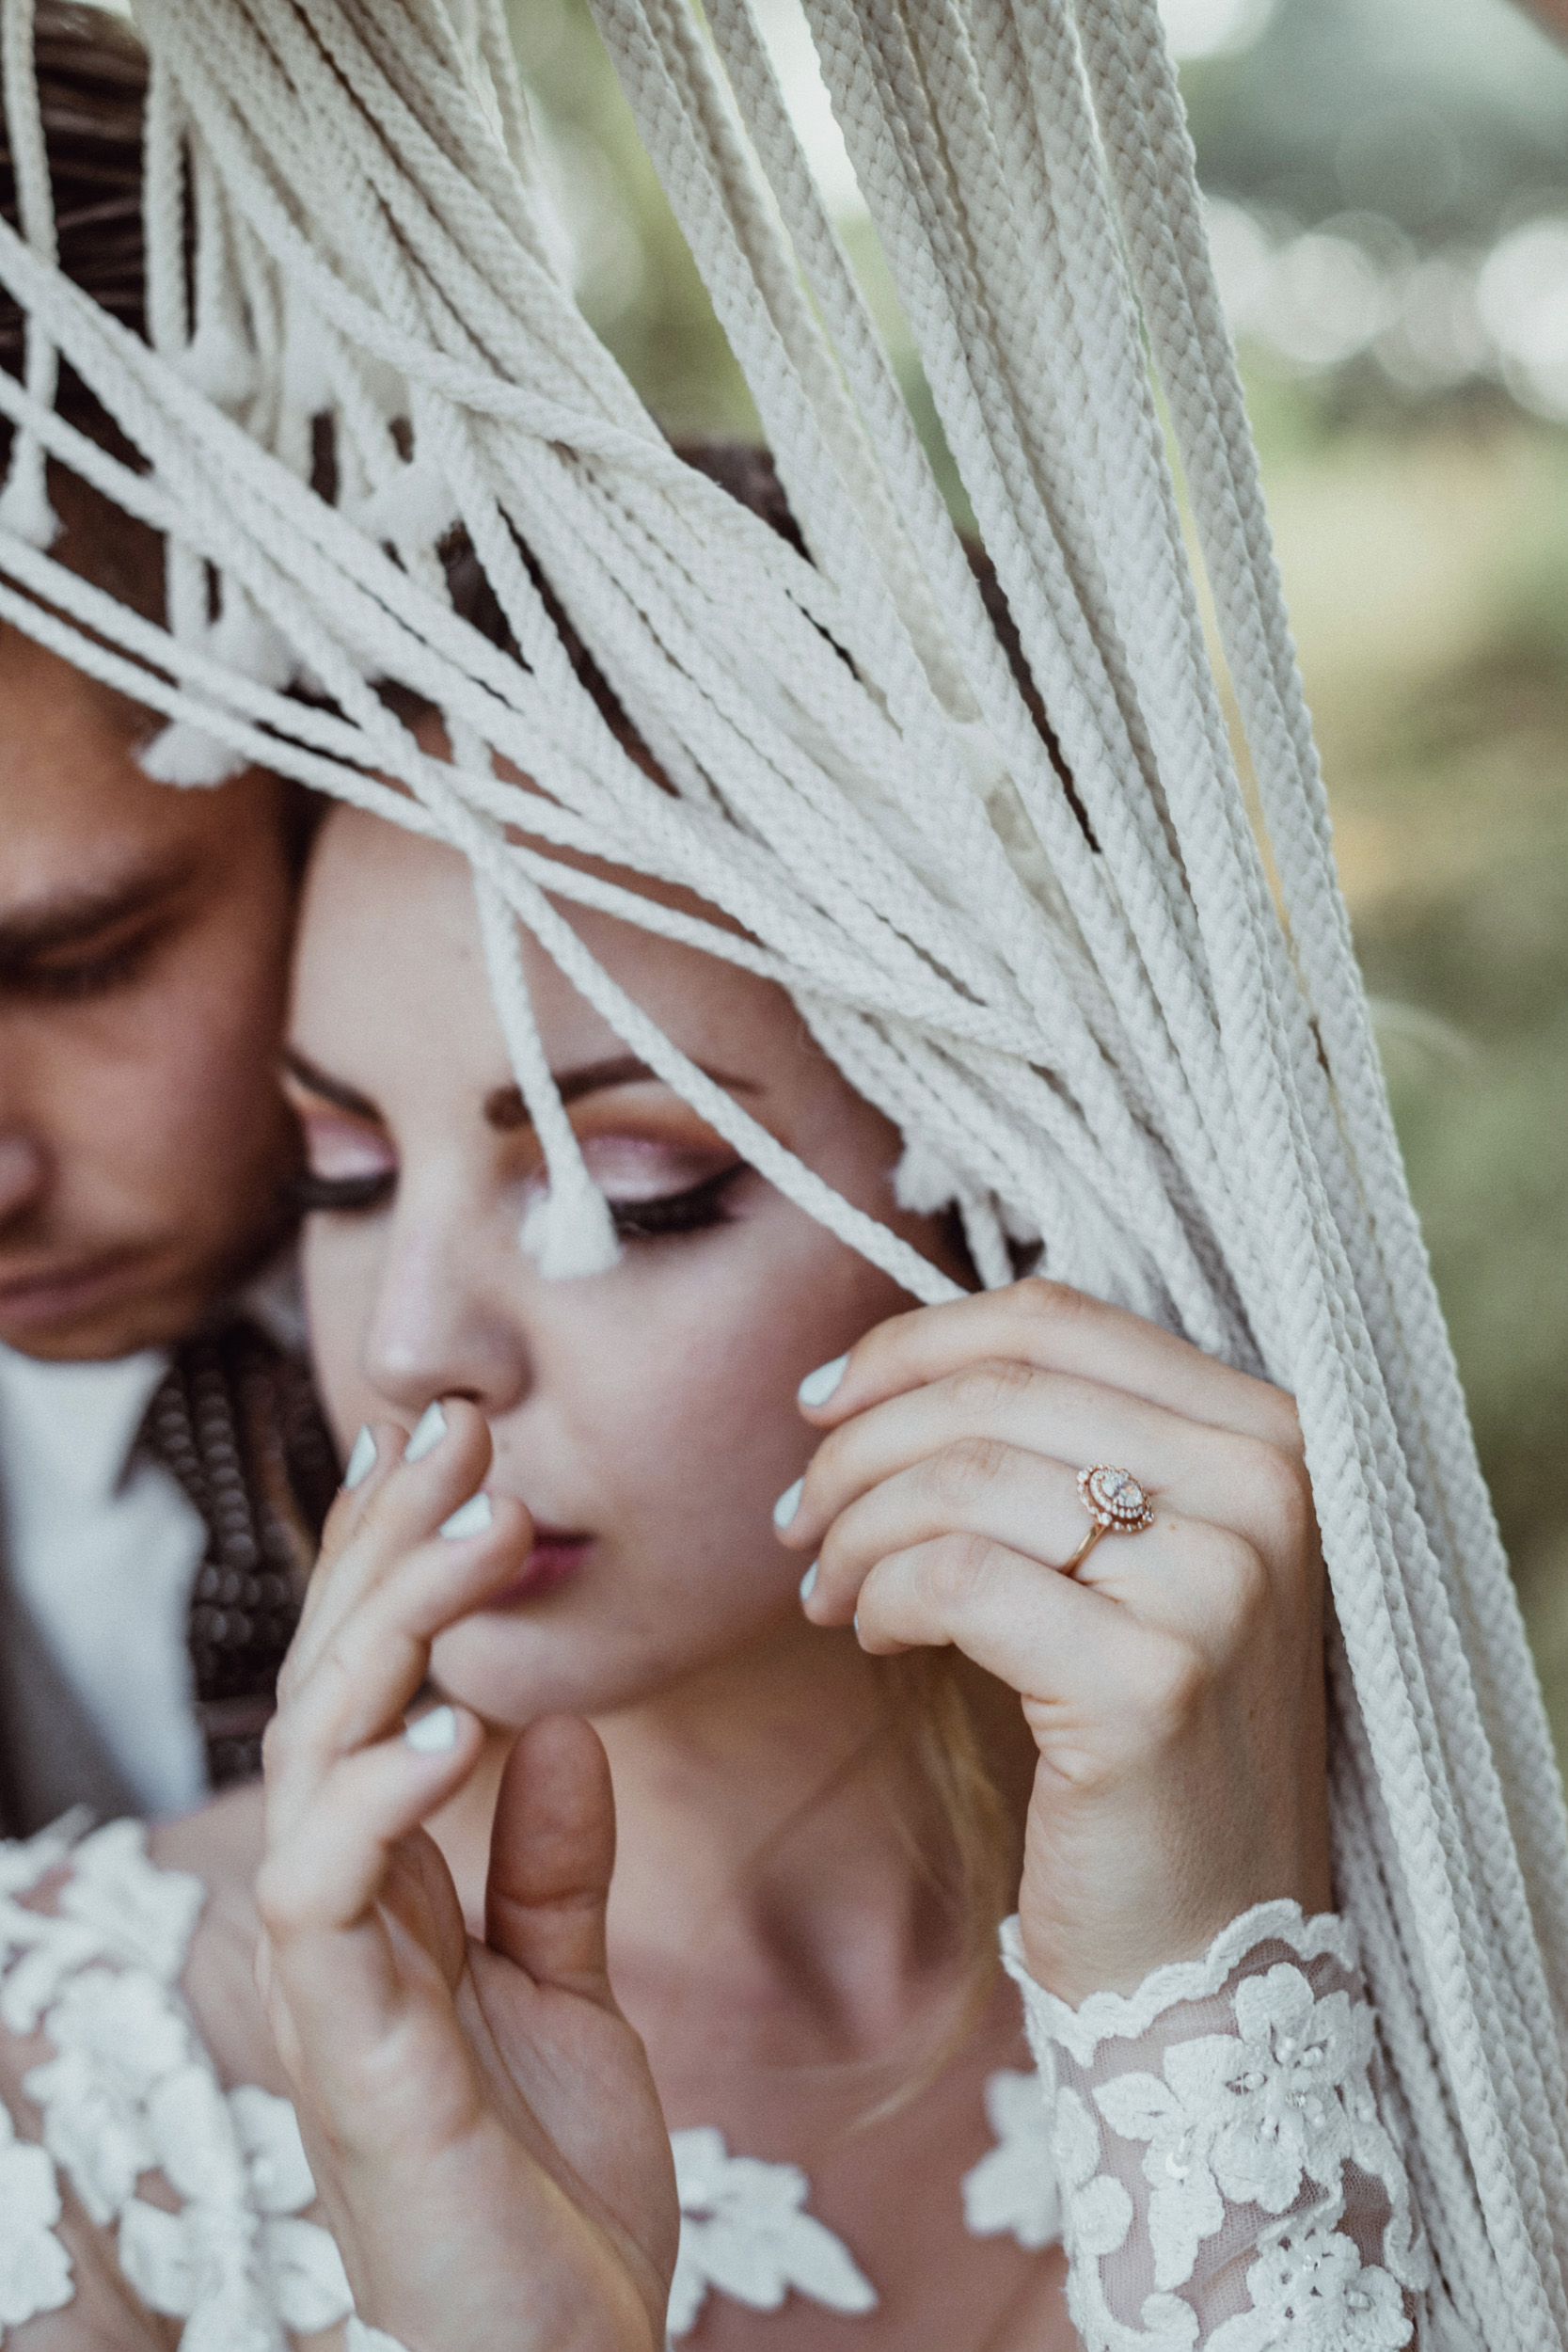 Bride wearing rose gold wedding ring in lace dress